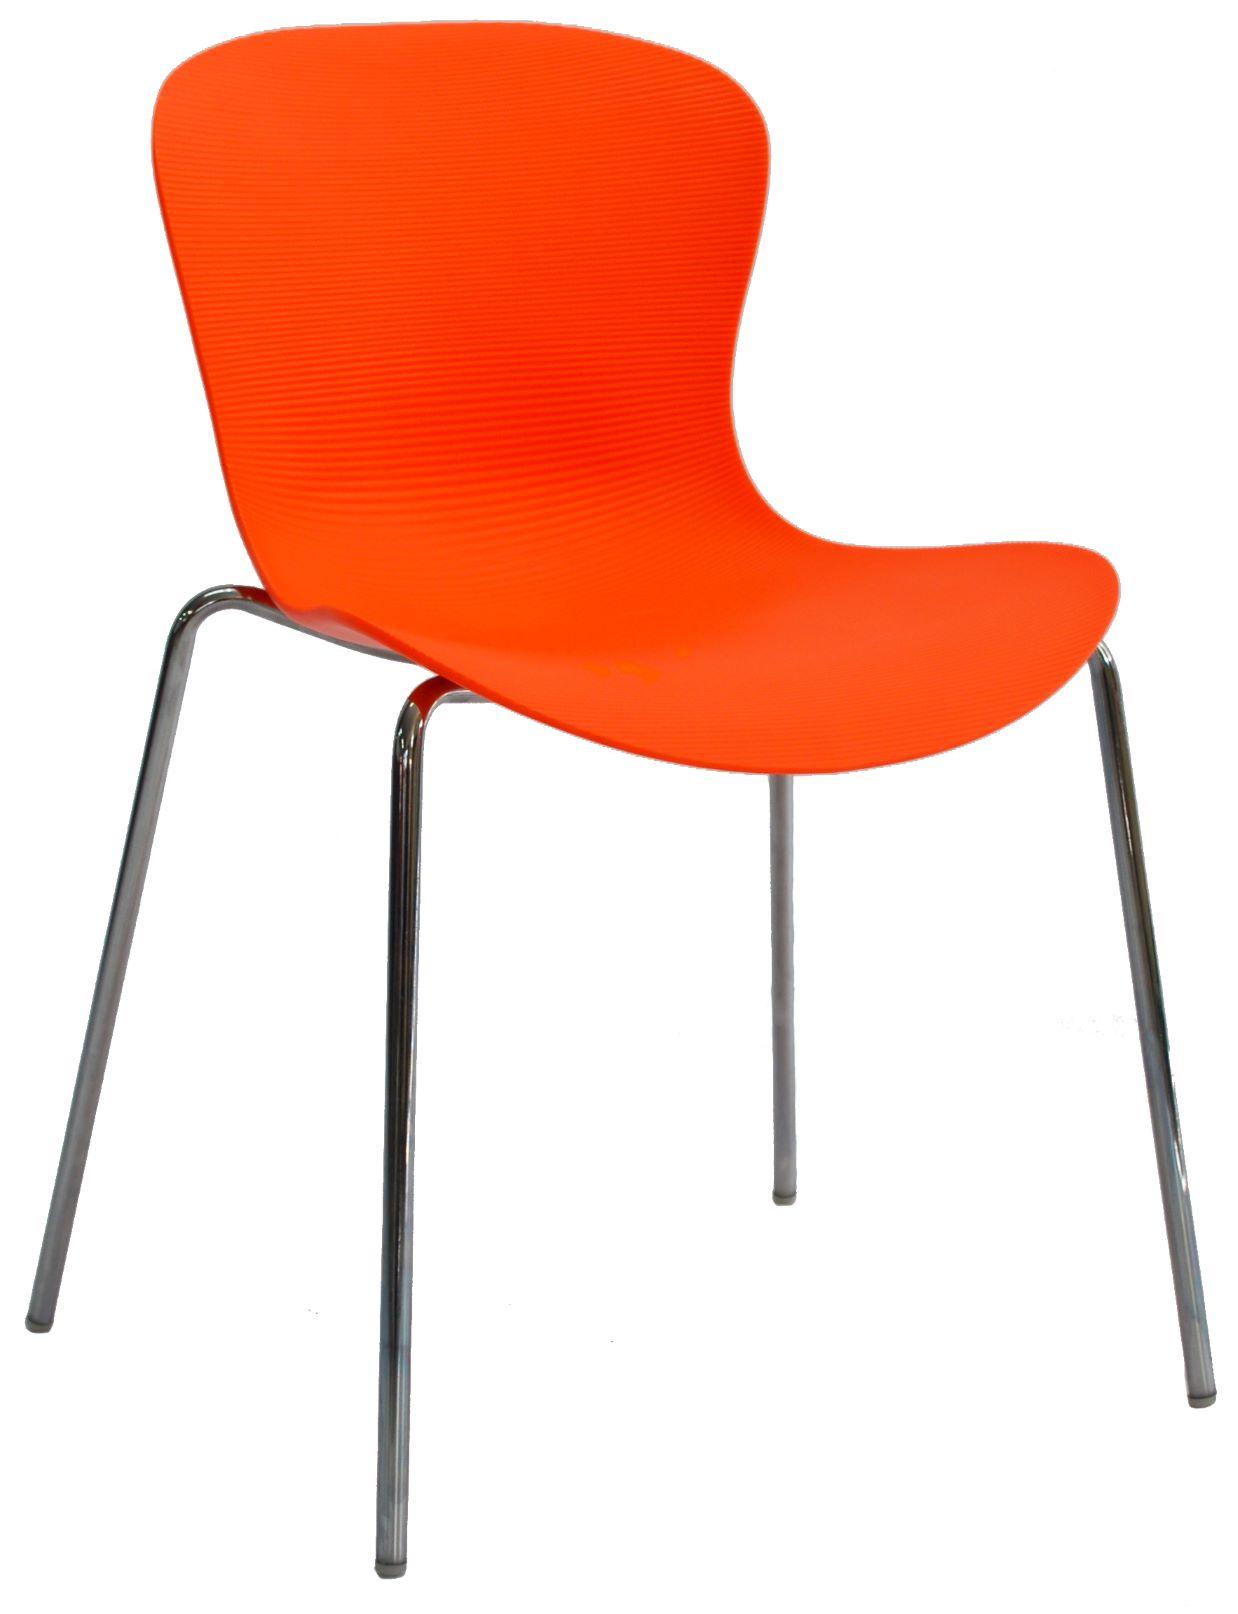 GS1401-橘